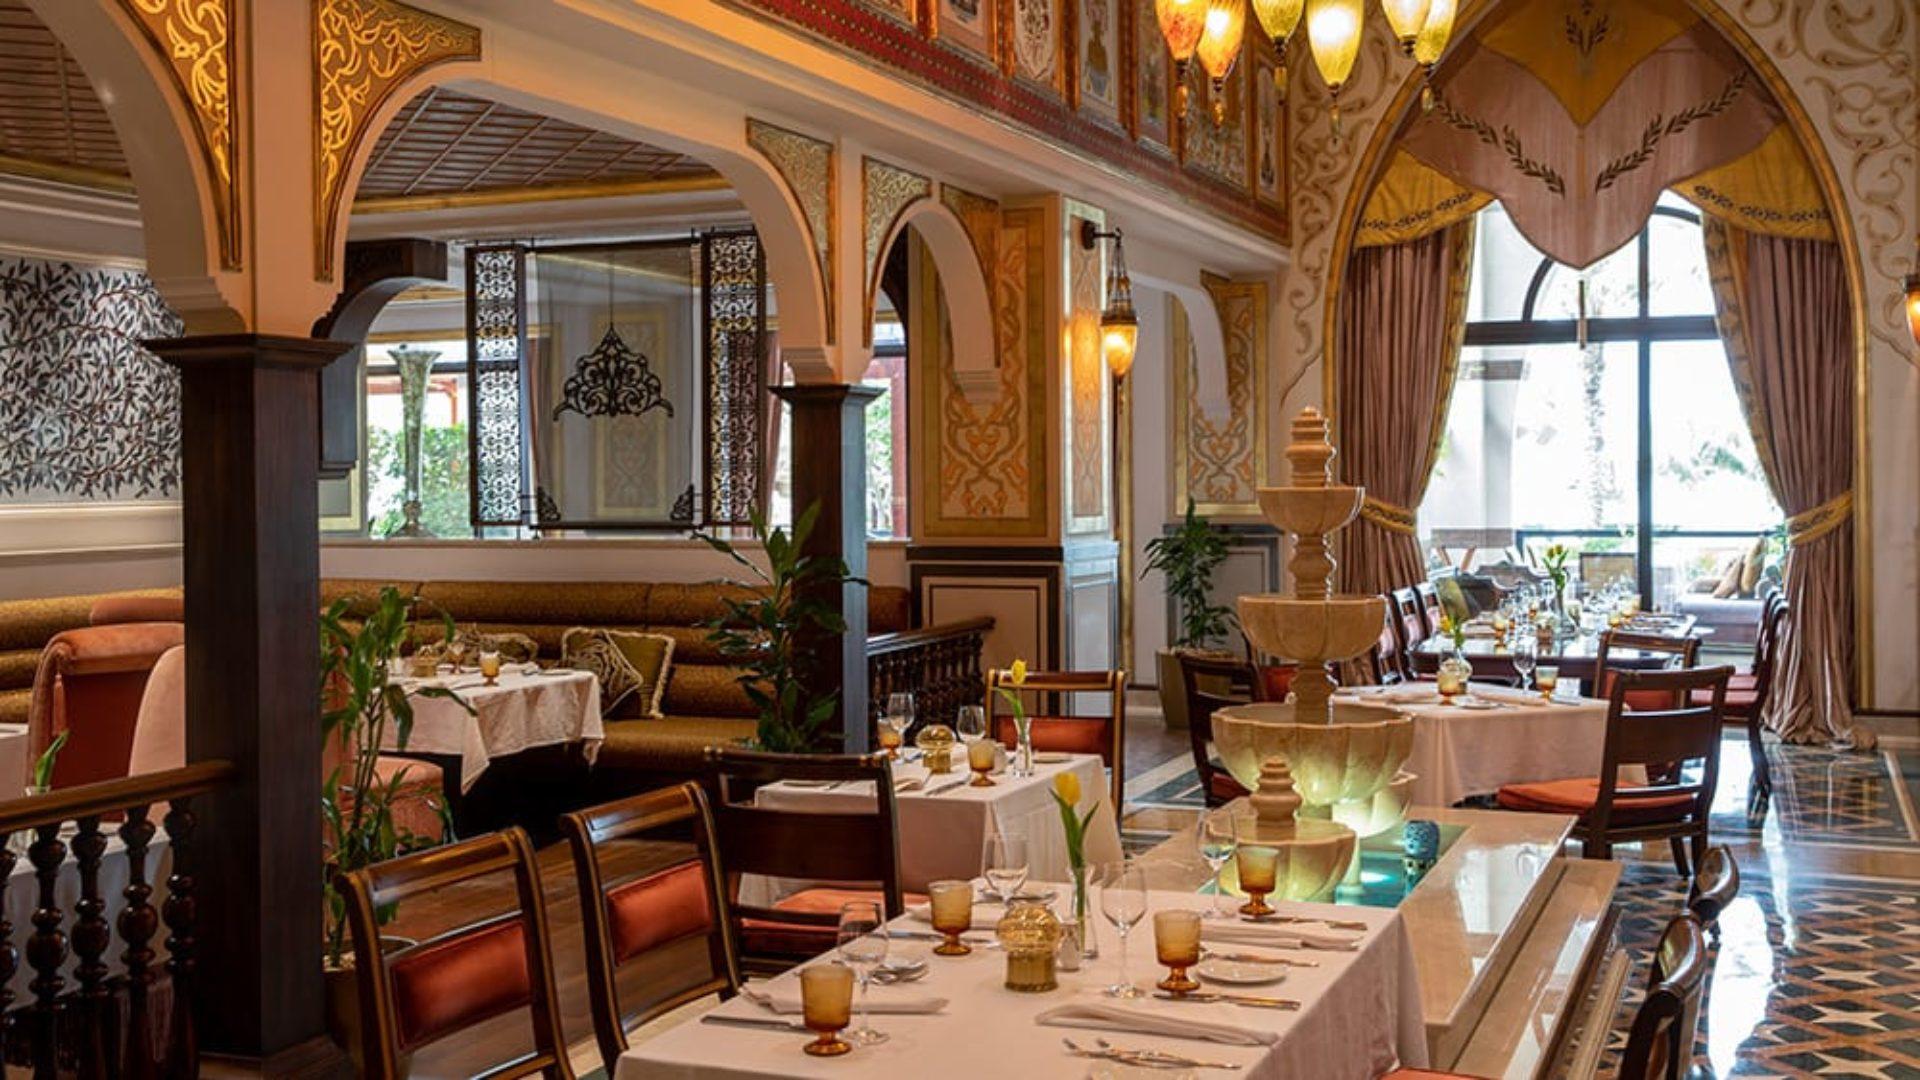 Indoor dining at Lalezar Restaurant at Jumeirah Zabeel Saray